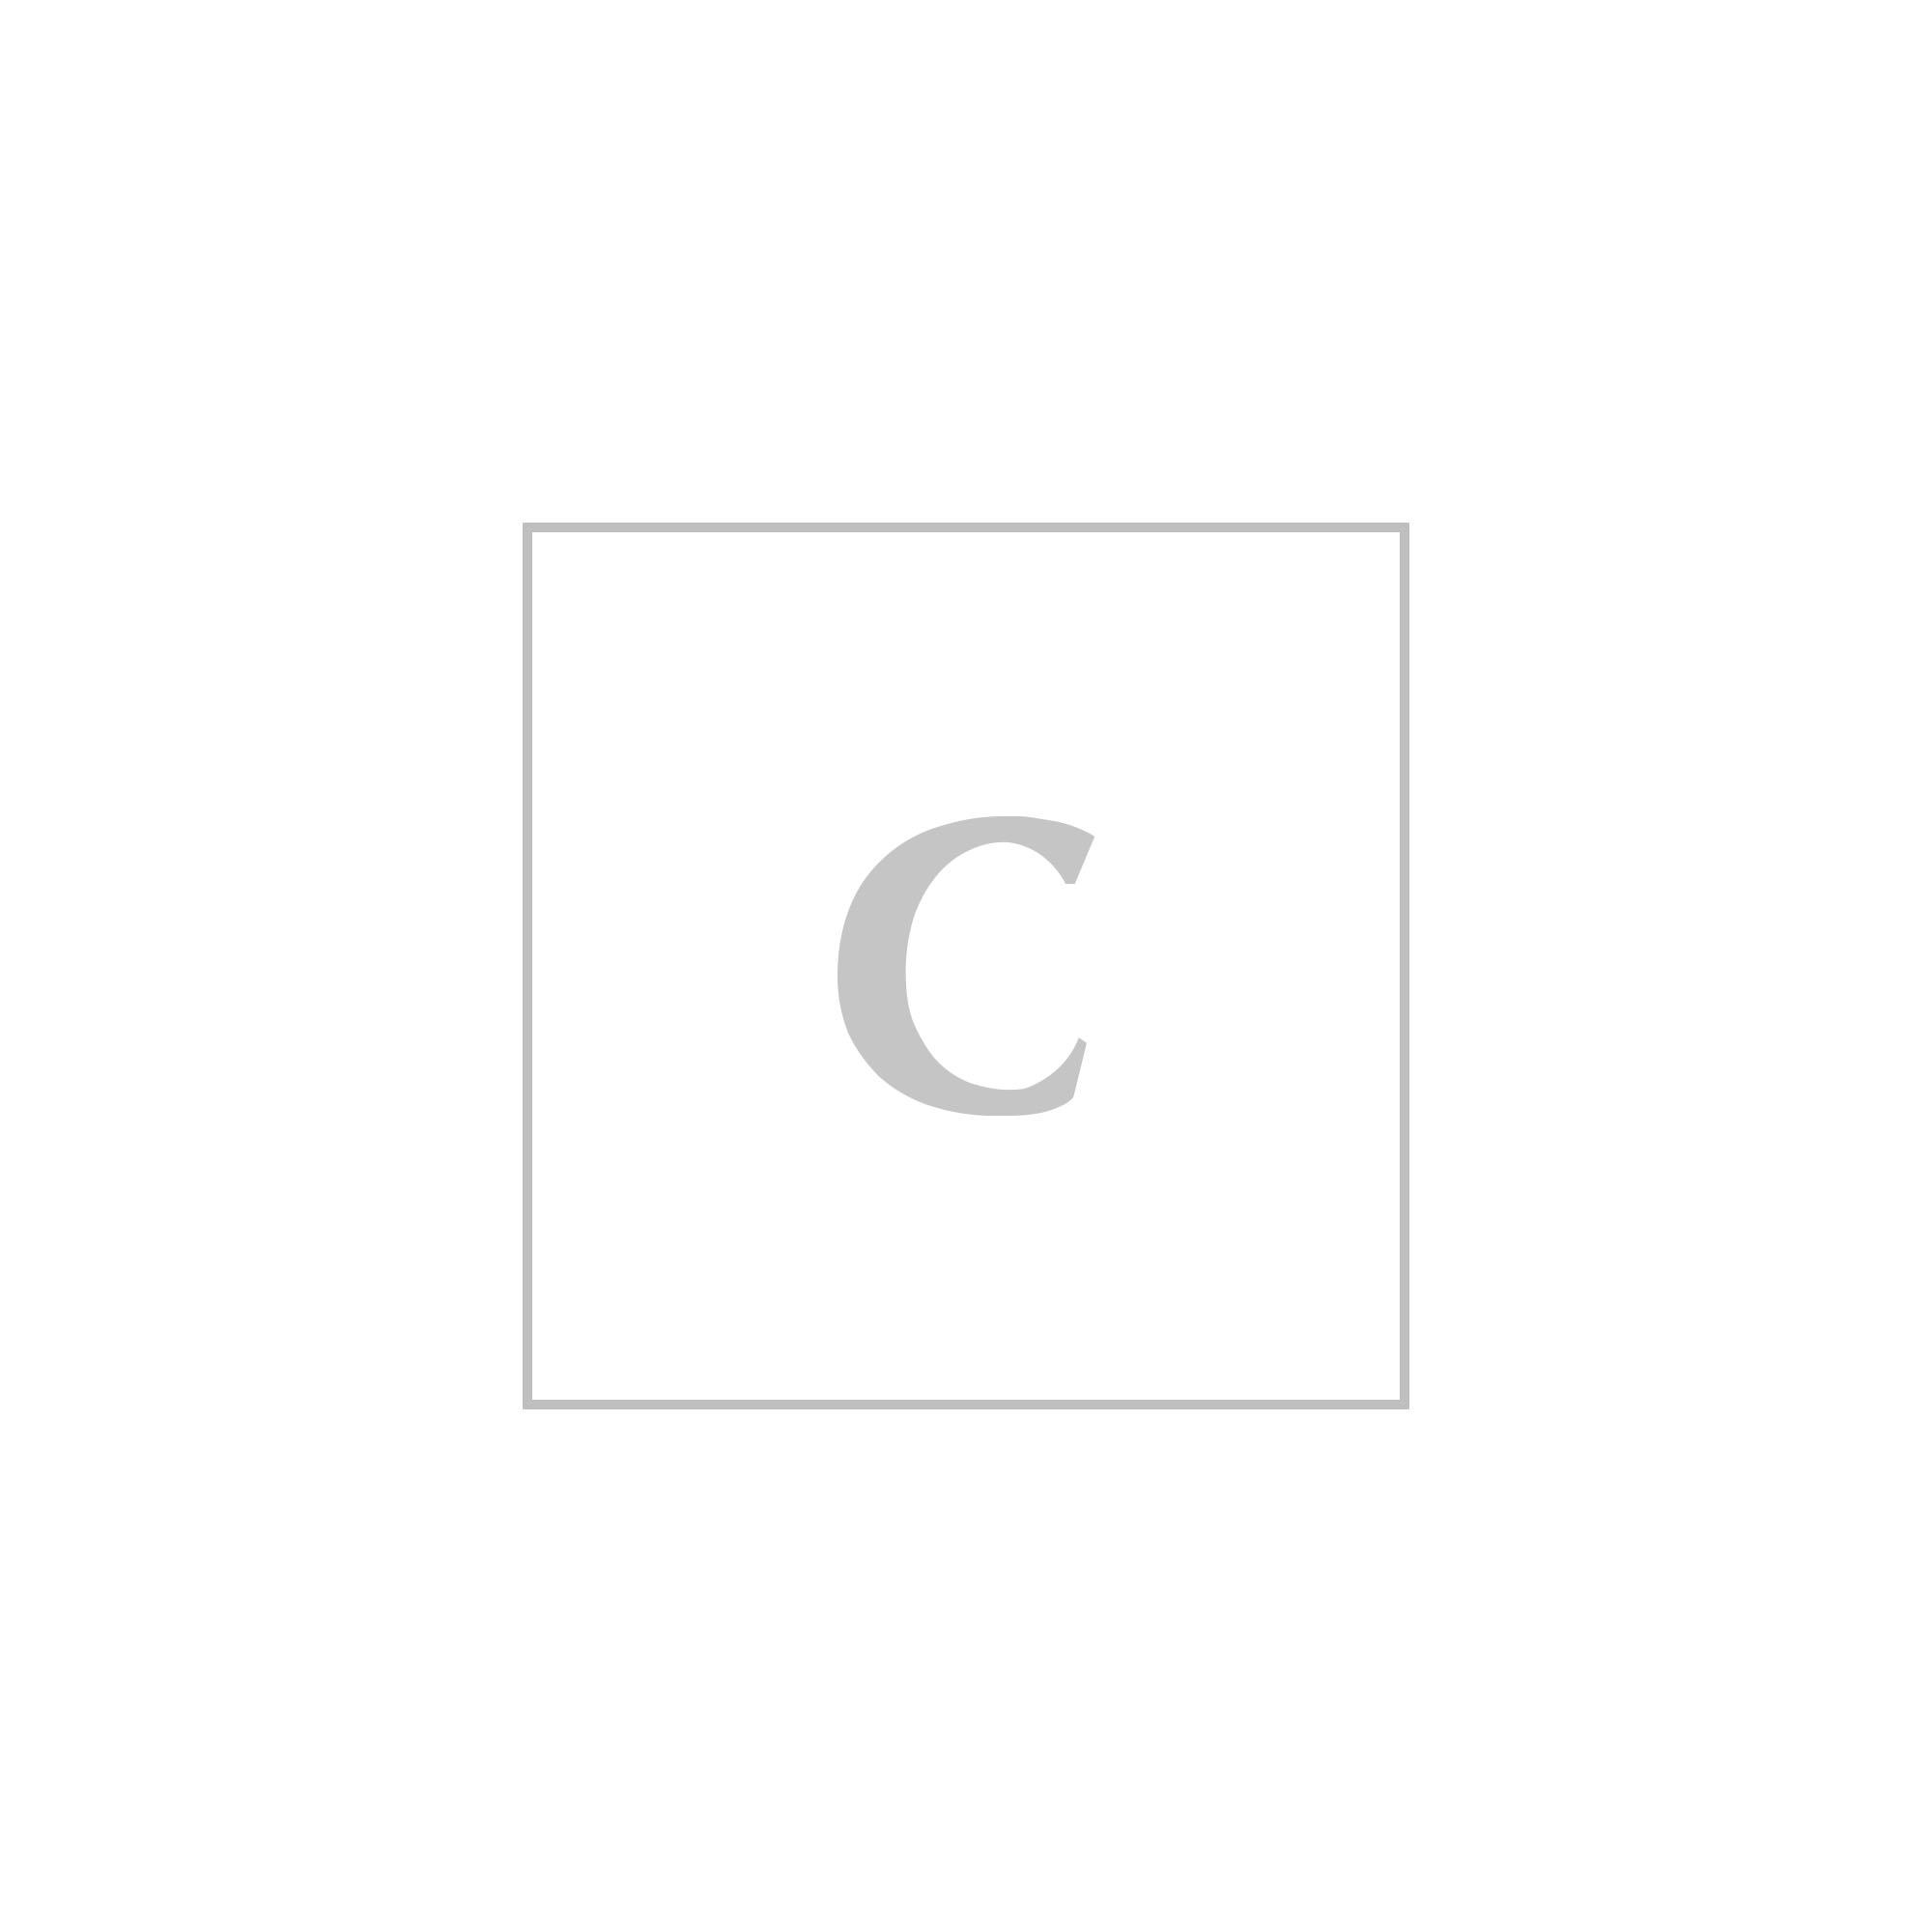 Salvatore ferragamo valigeria amsterdam 249740 002 polies. 1224090/wr